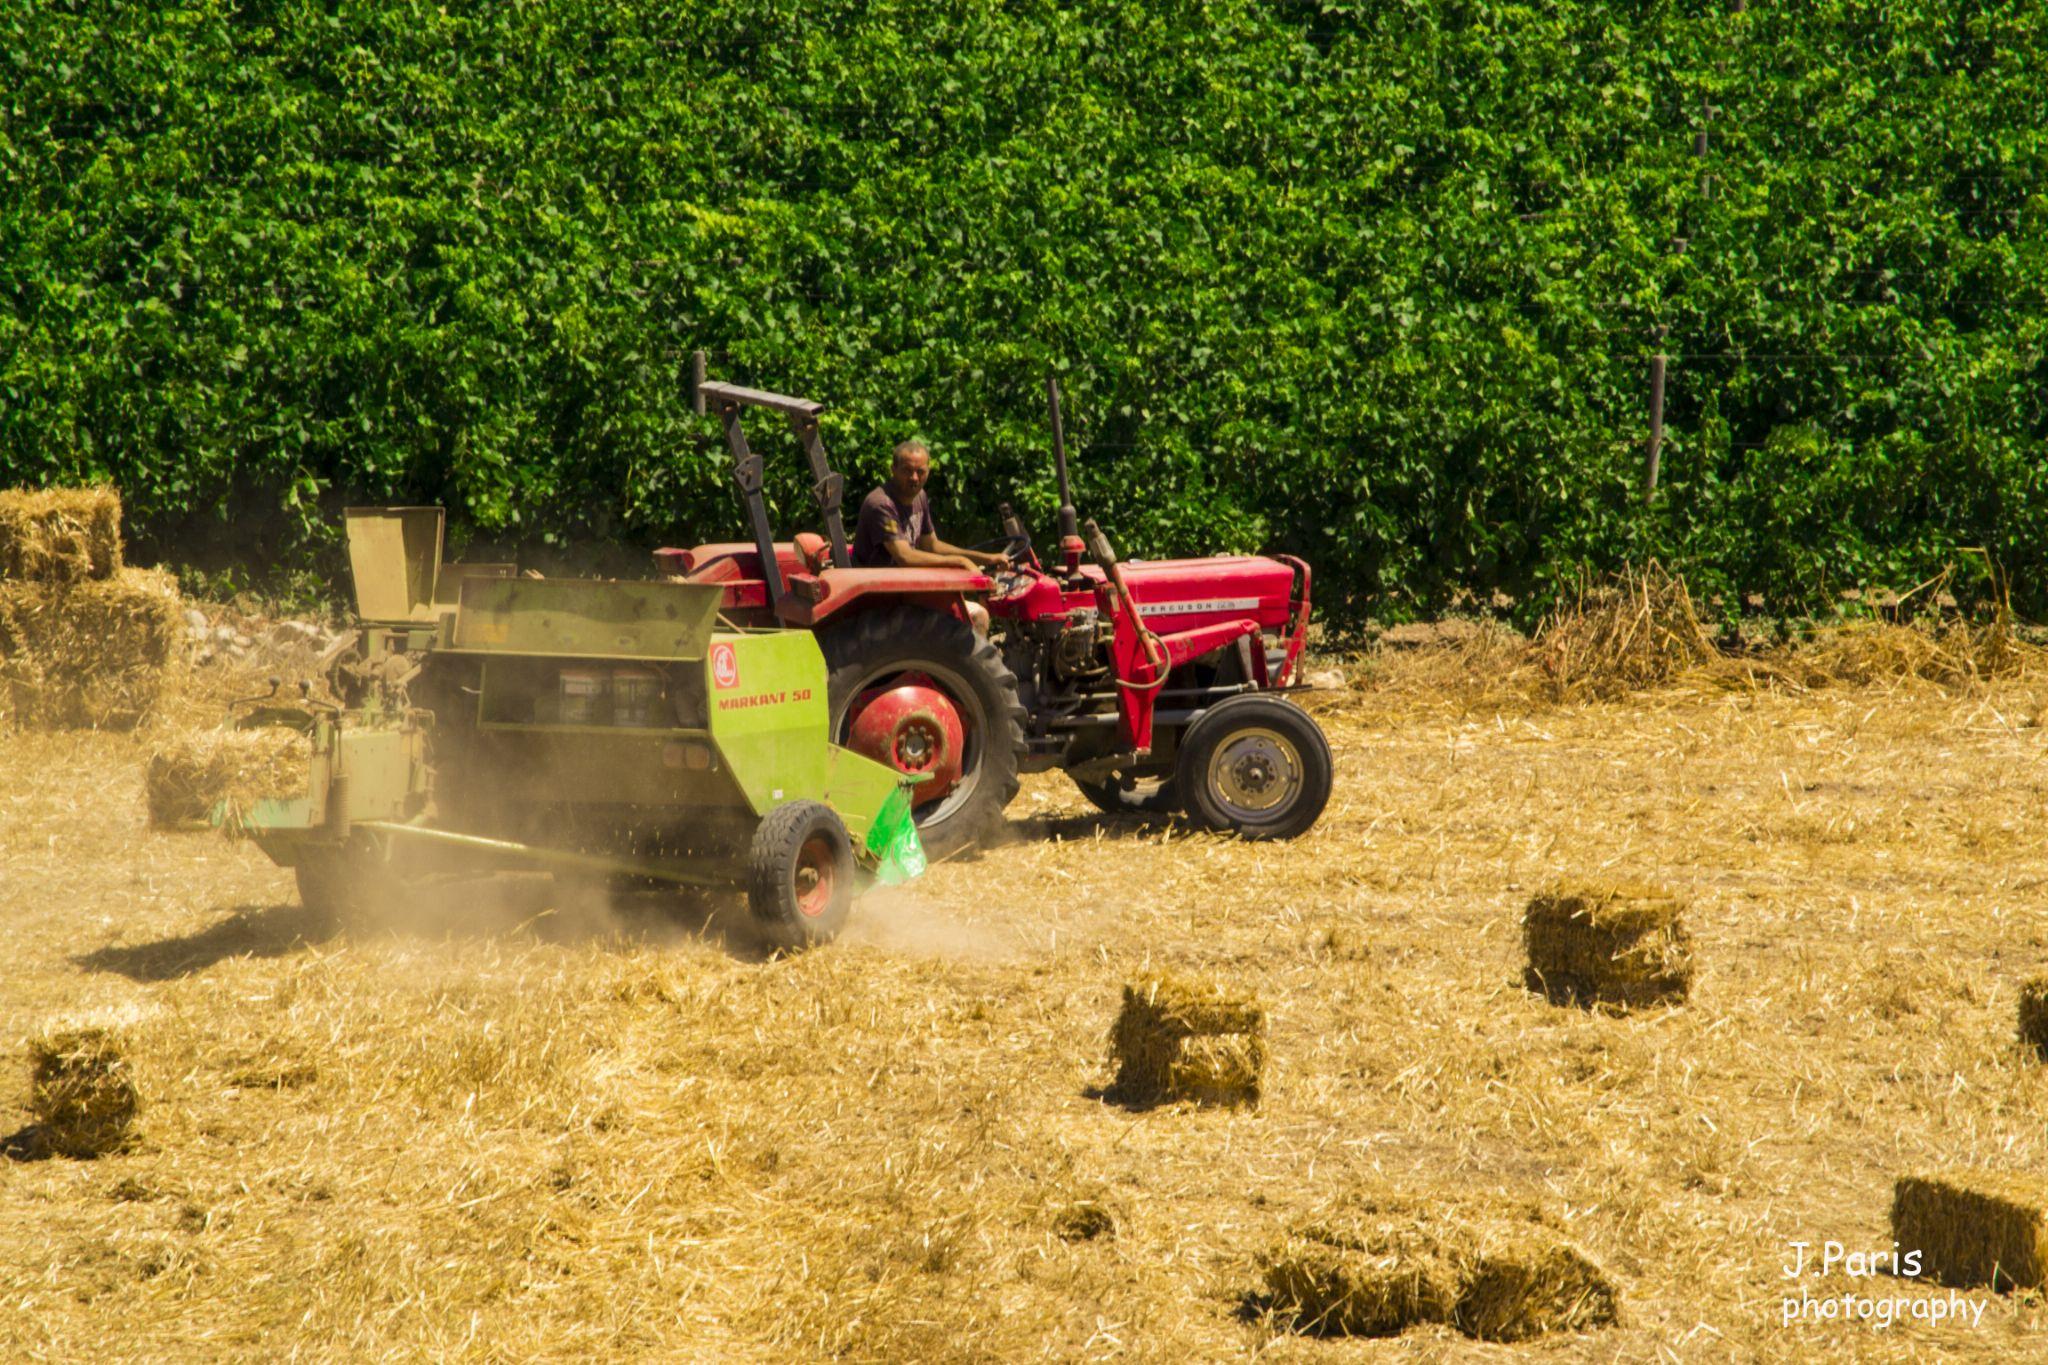 Harvest by Jonathan Paris